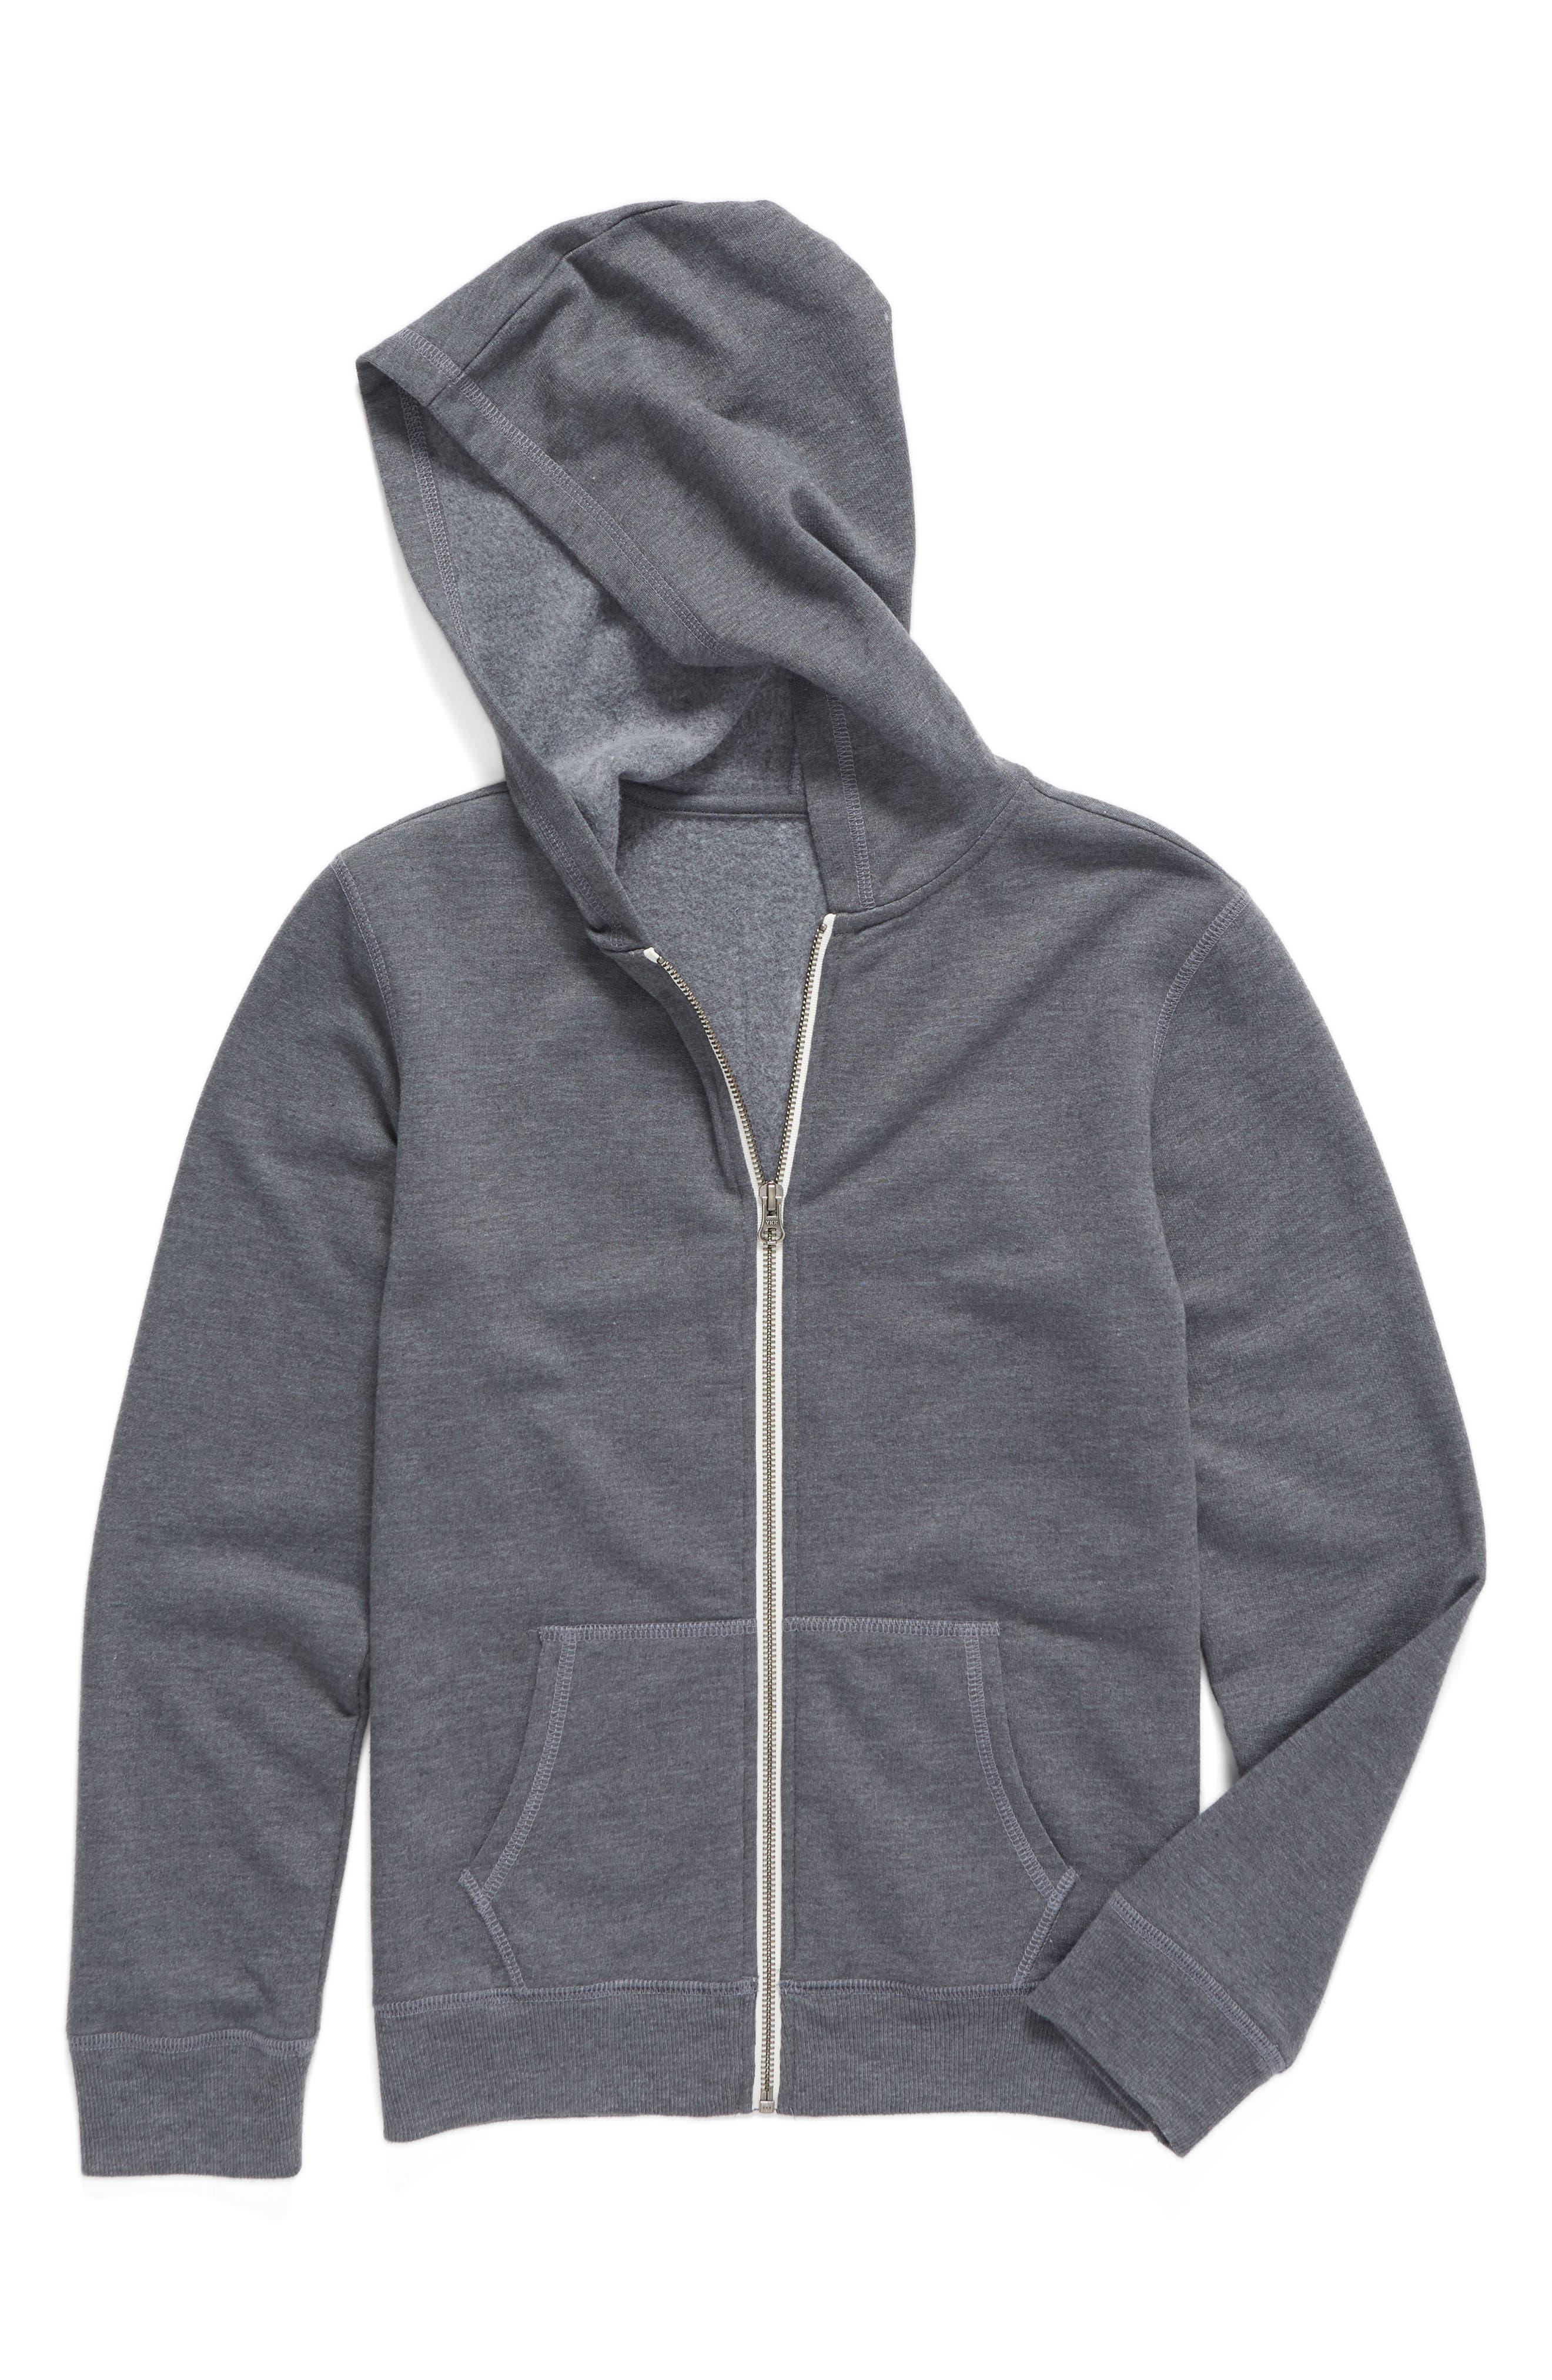 Zip-Up Hooded Sweatshirt,                             Main thumbnail 1, color,                             030